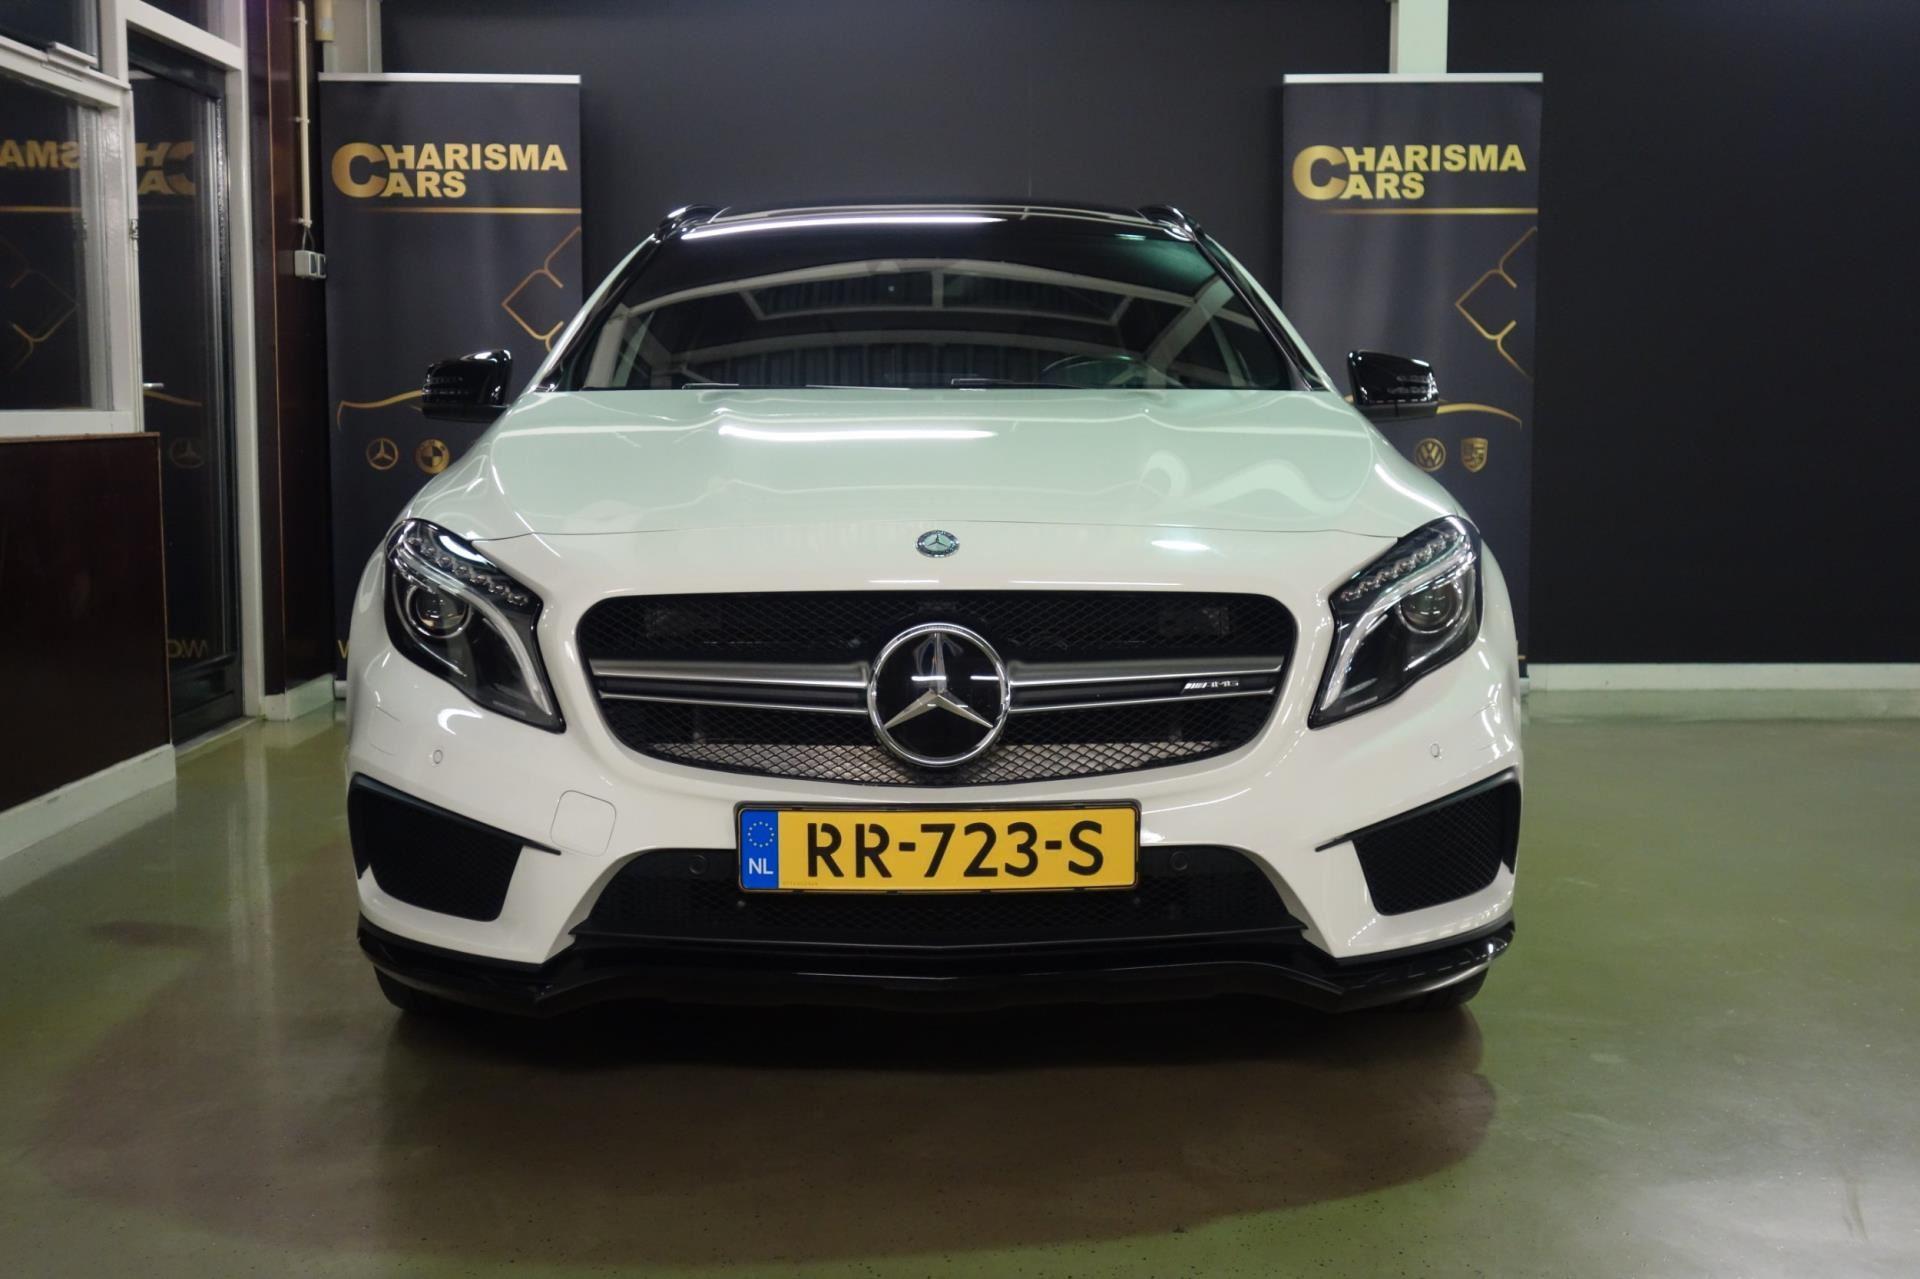 Mercedes-Benz GLA-klasse occasion - Charisma Cars